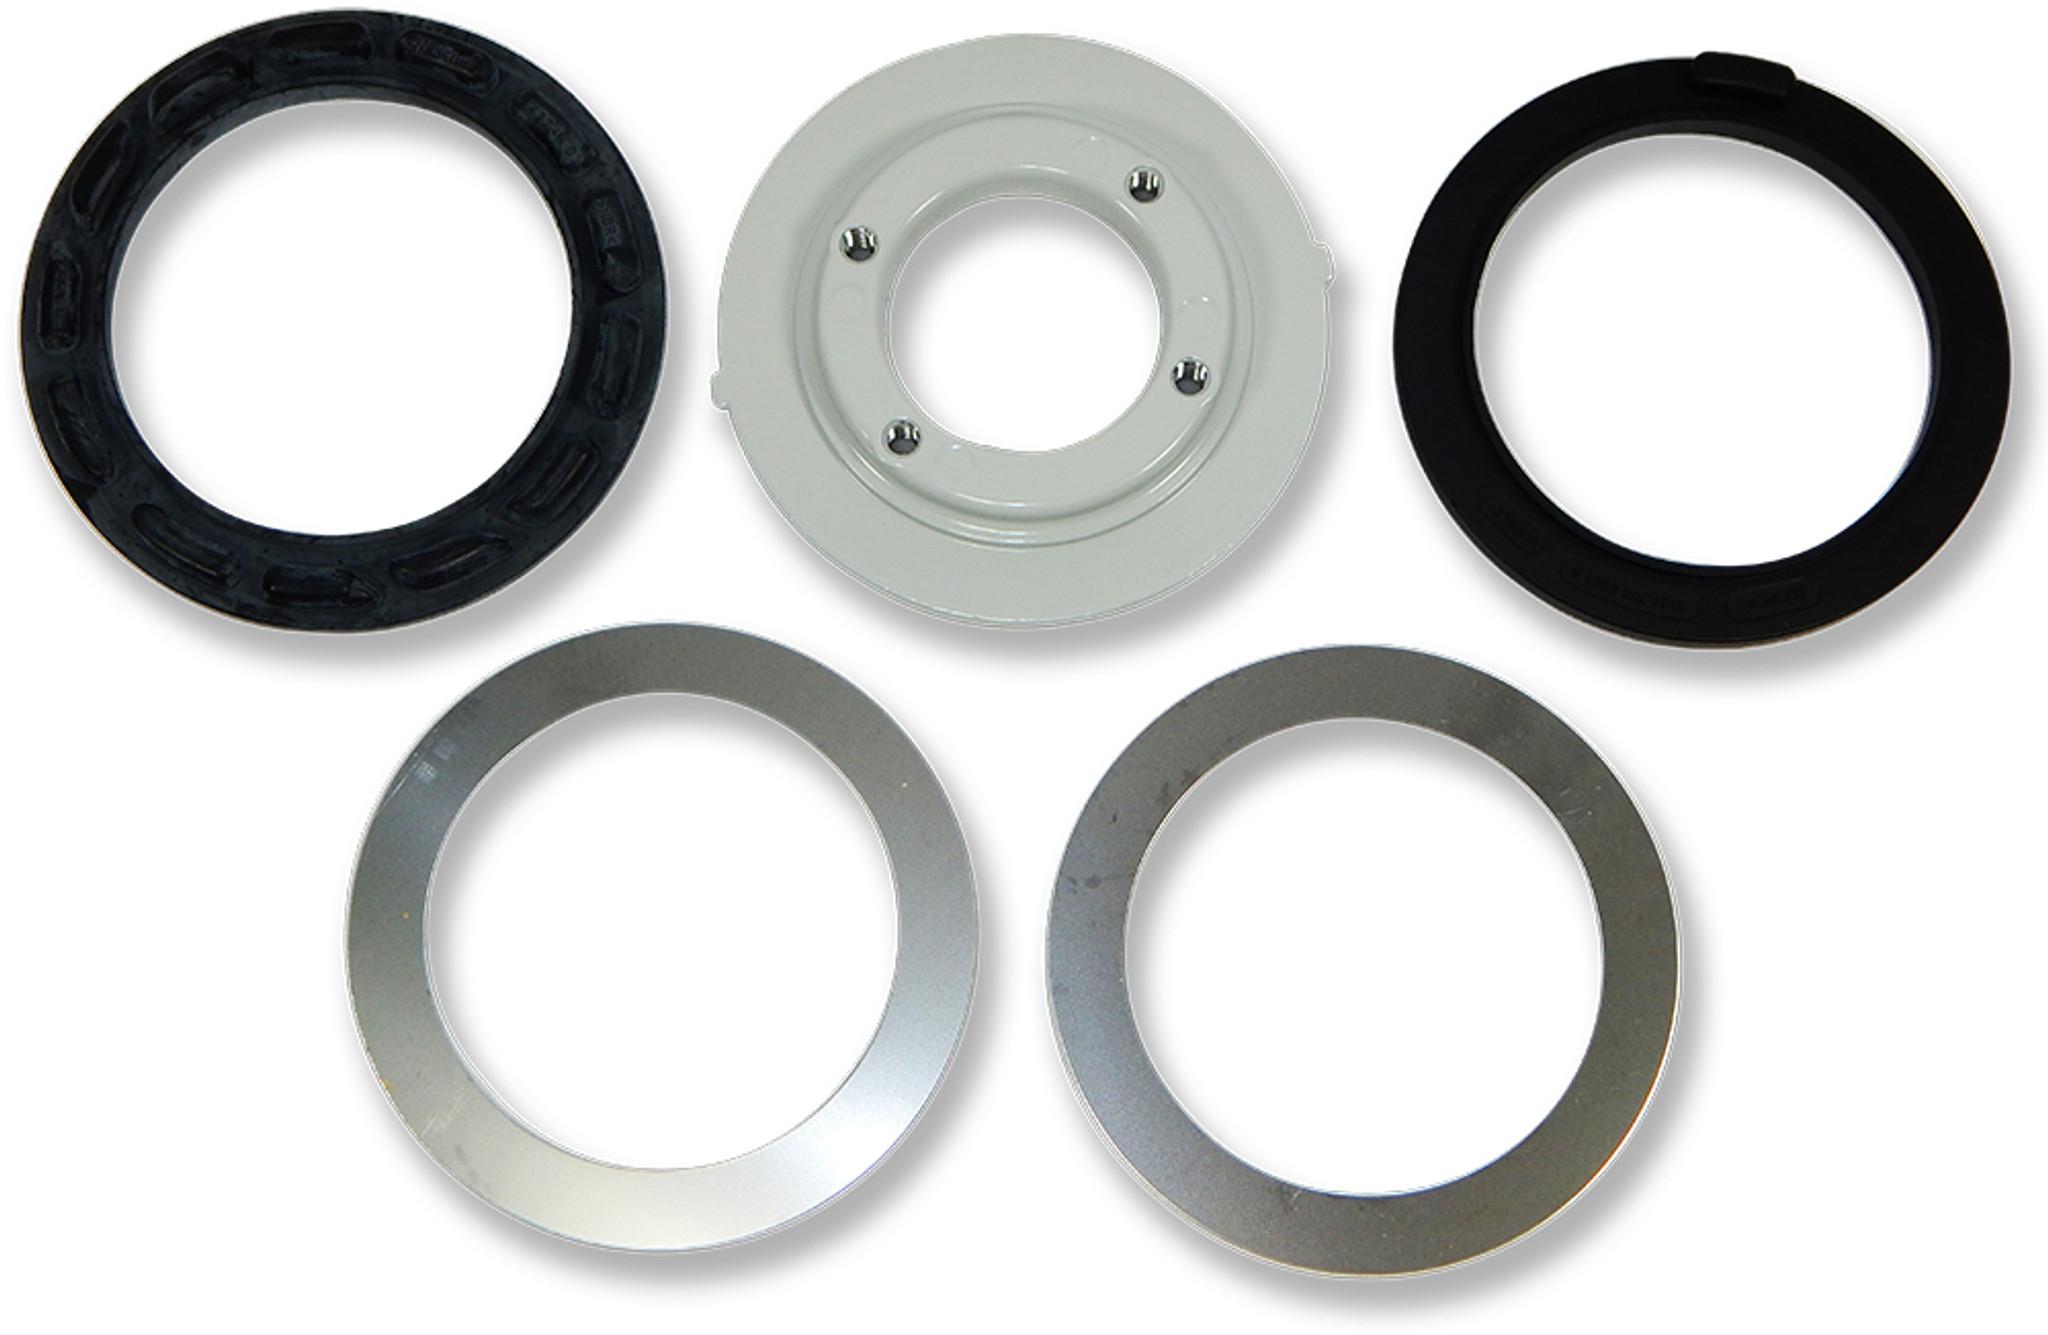 Blade Washer, Rubber Ring Set | Stihl TS410, TS420 | 4201-706-9202 ...